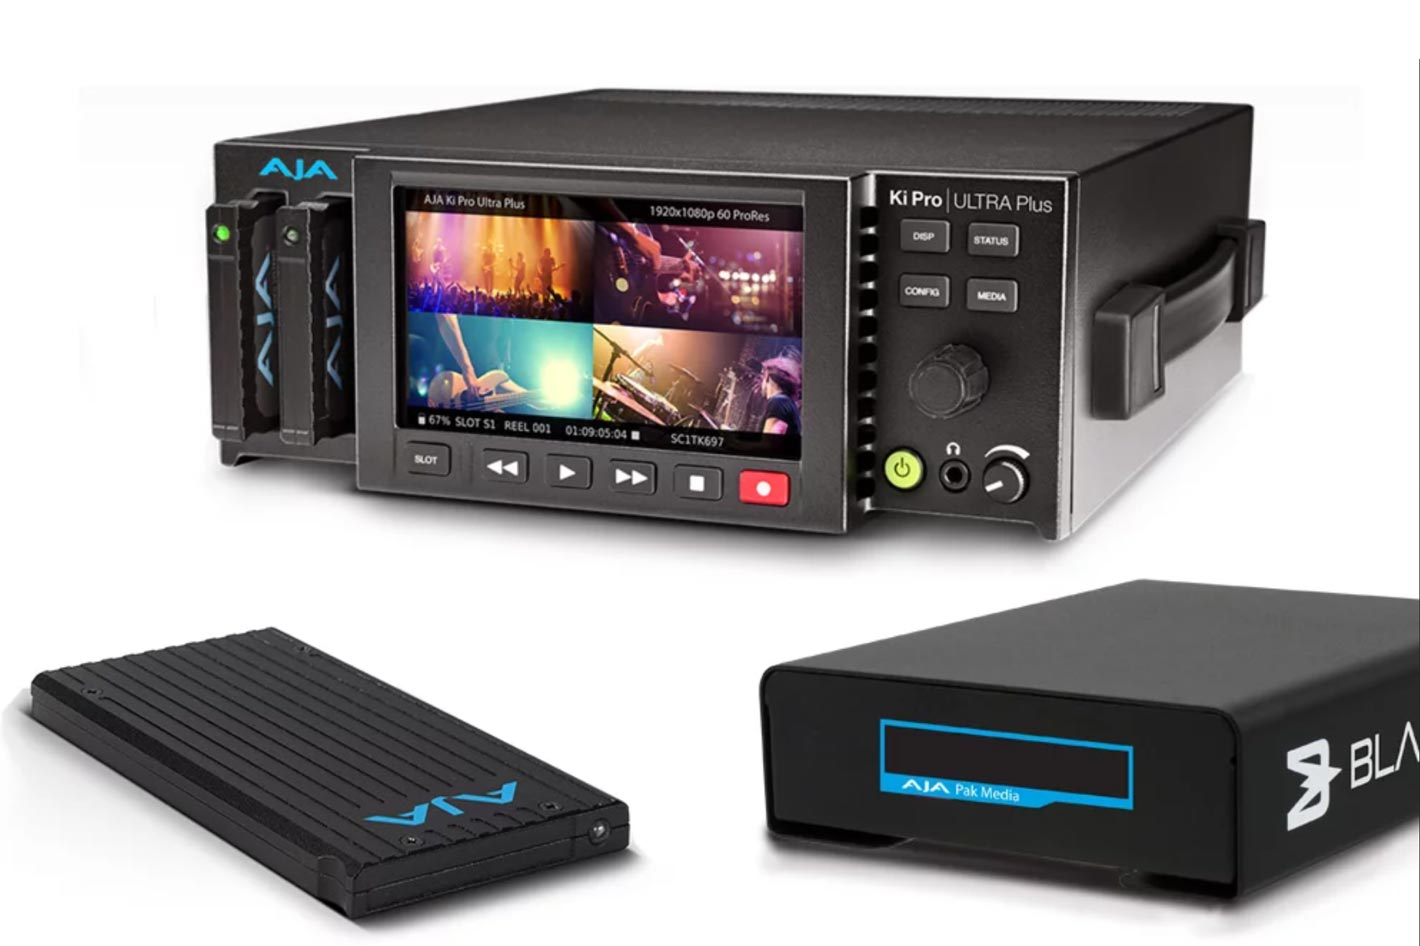 Blackjet VX-1P, a new media reader for AJA Pak Media